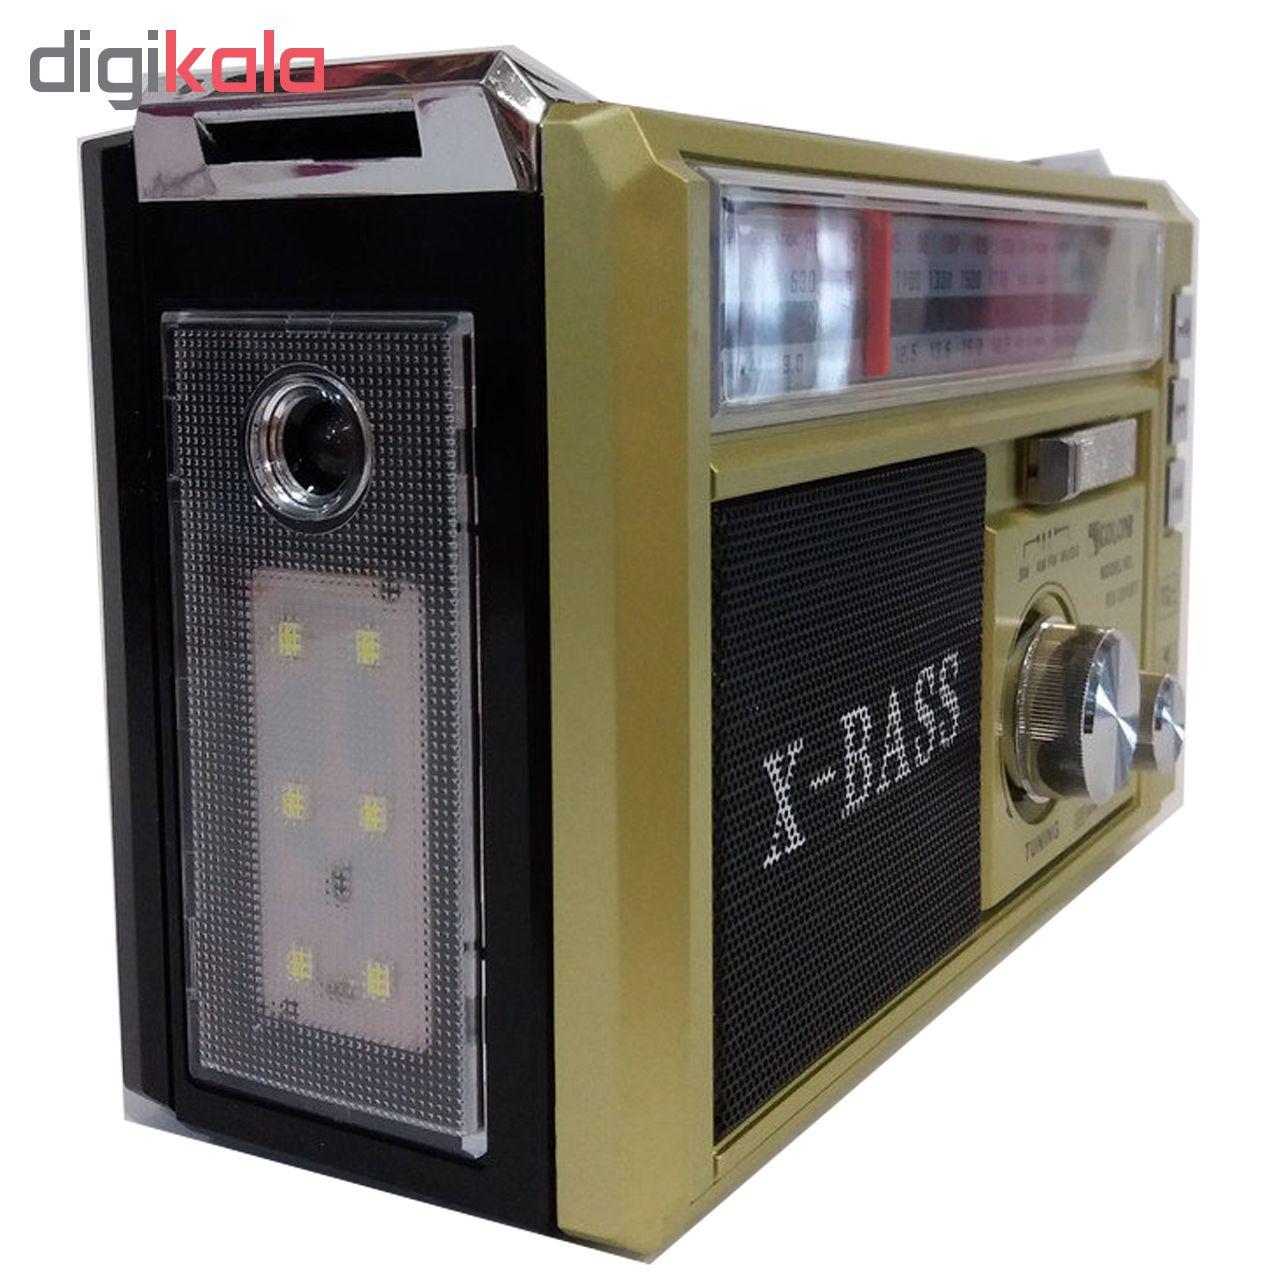 رادیو بلوتوثی گولون مدل RX-381BT main 1 6